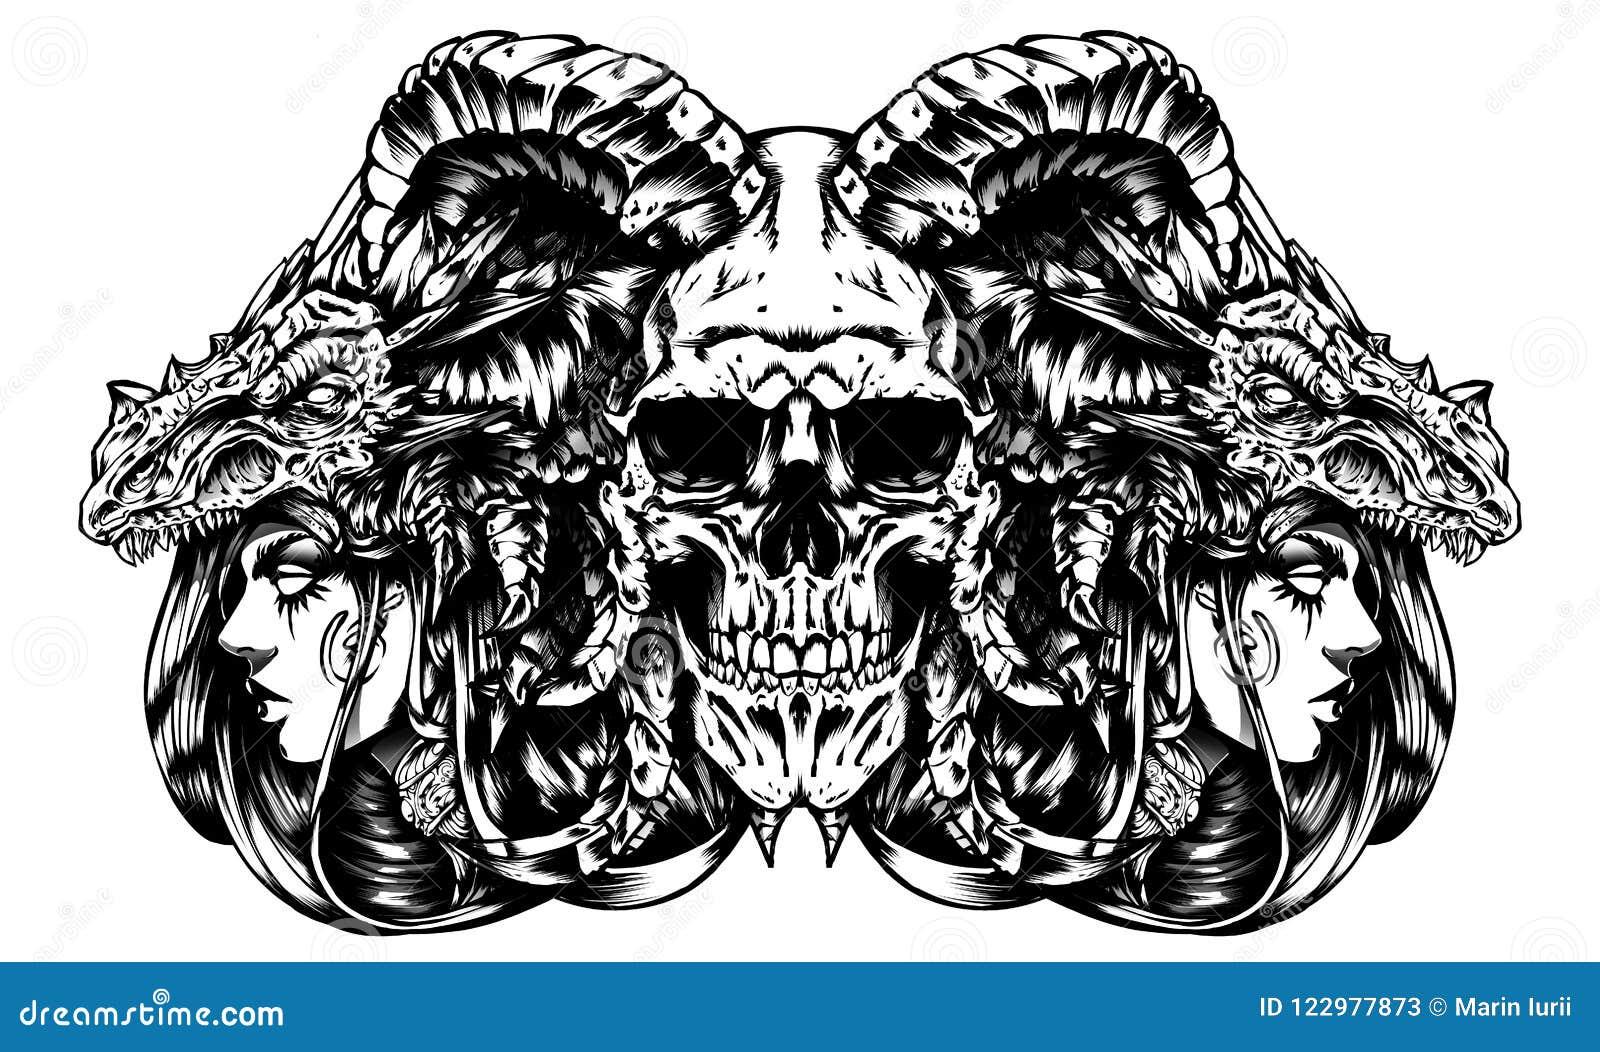 demon skull with witches dark art stock illustration illustration